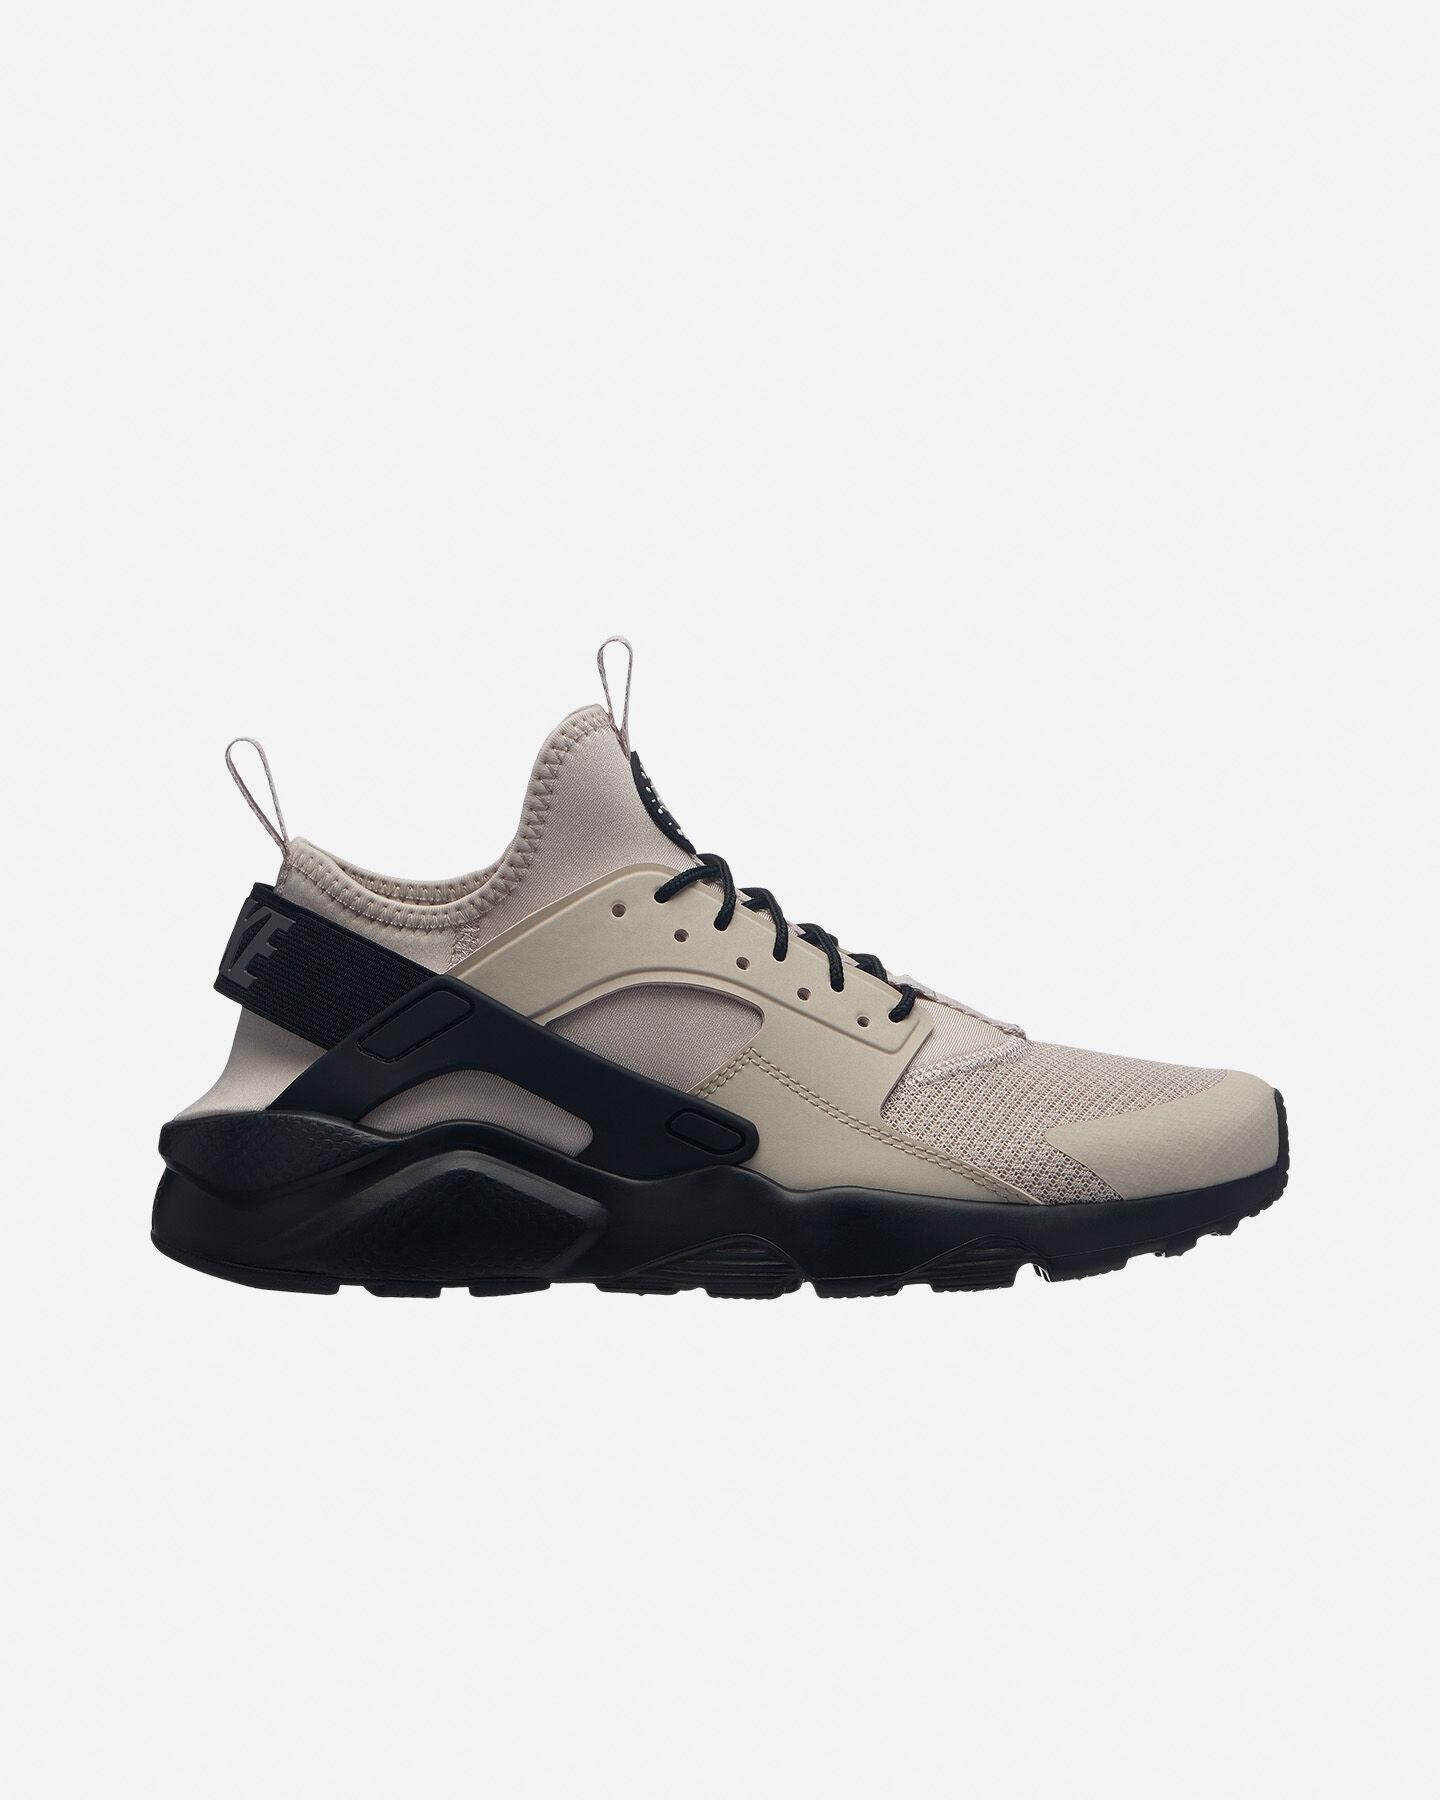 Scarpe Huarache Fffrpvq Online Nike Cisalfa Sport Su rrnO4qTB